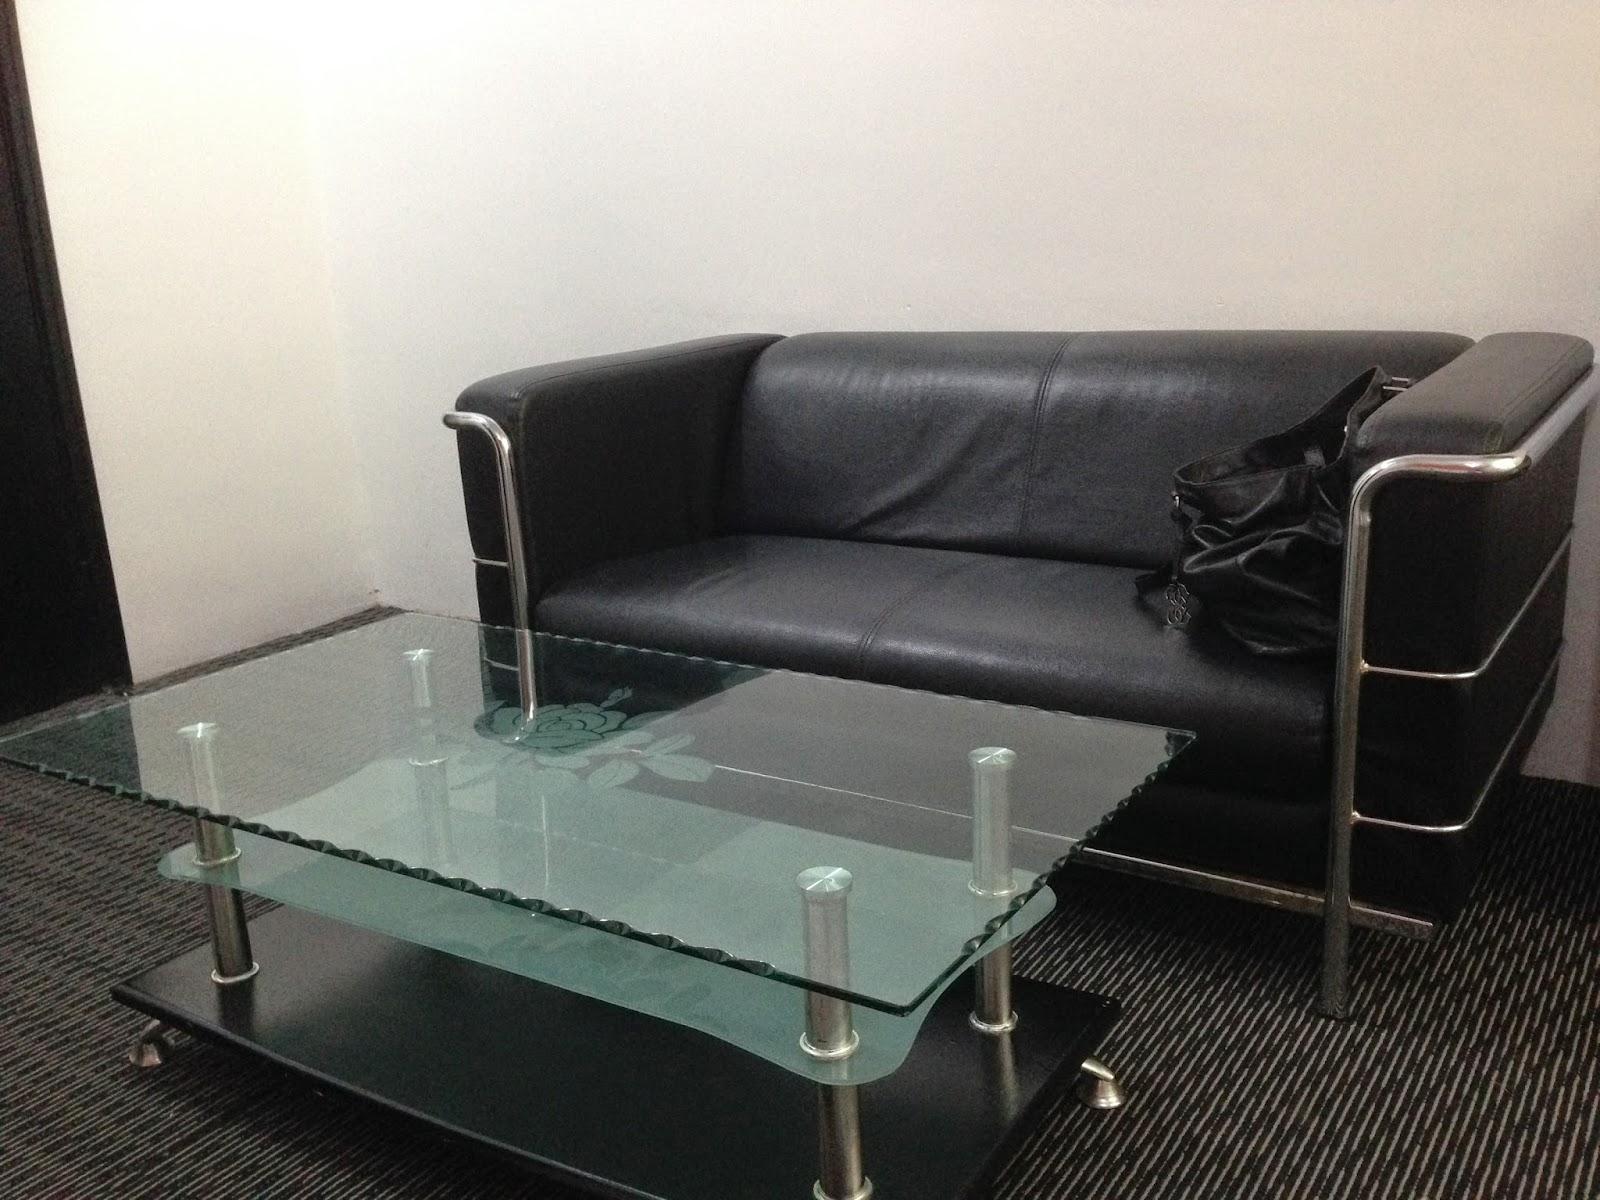 Ridel Hotel executive room decor